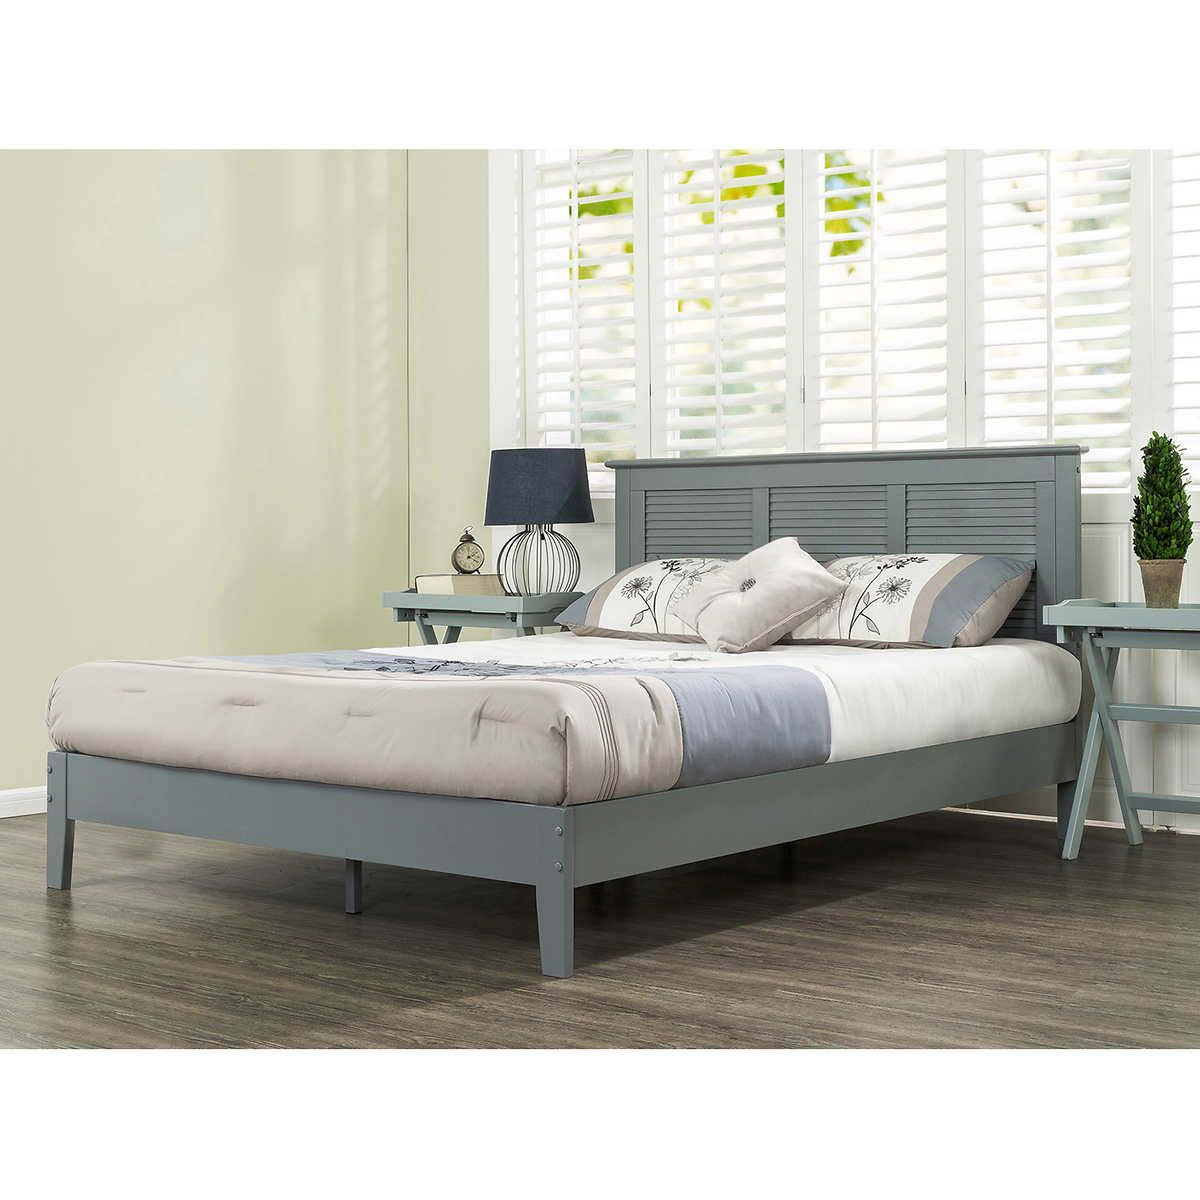 Blackstone Elite Kerrigan Full Panel Bed Frame Panel Bed